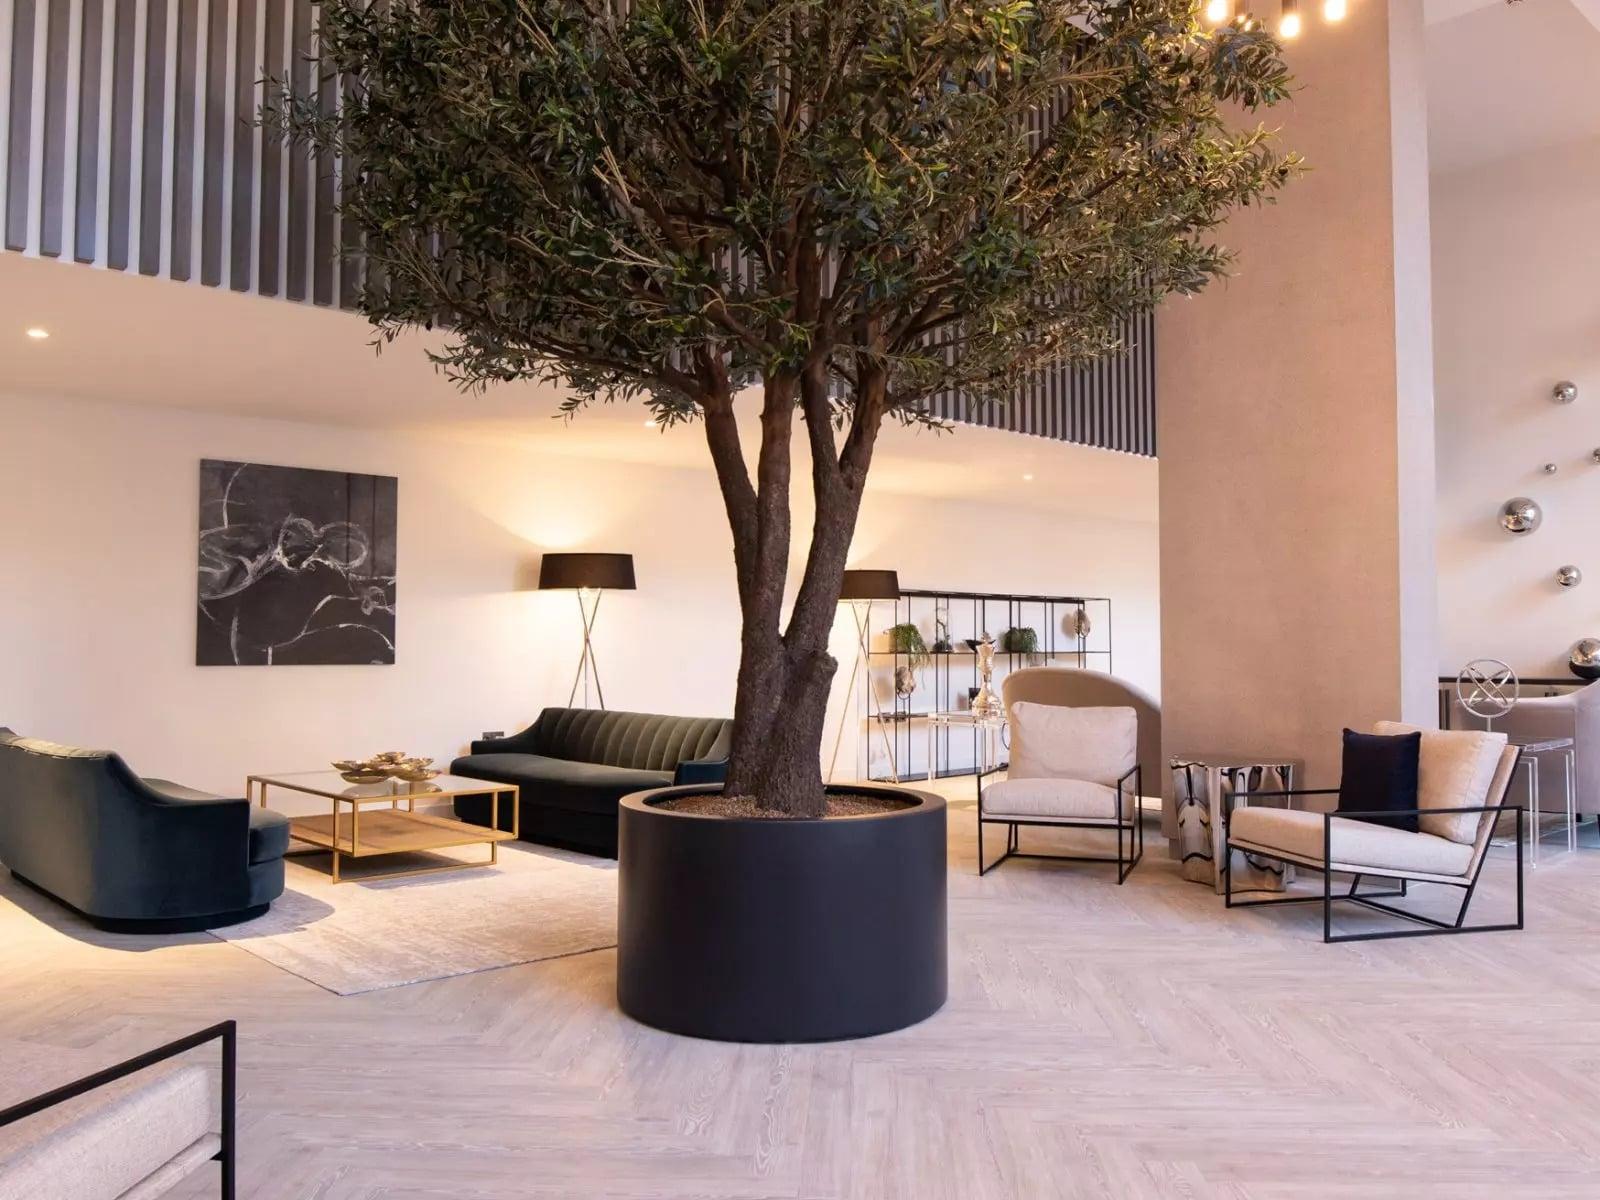 Local Crescent Lounge